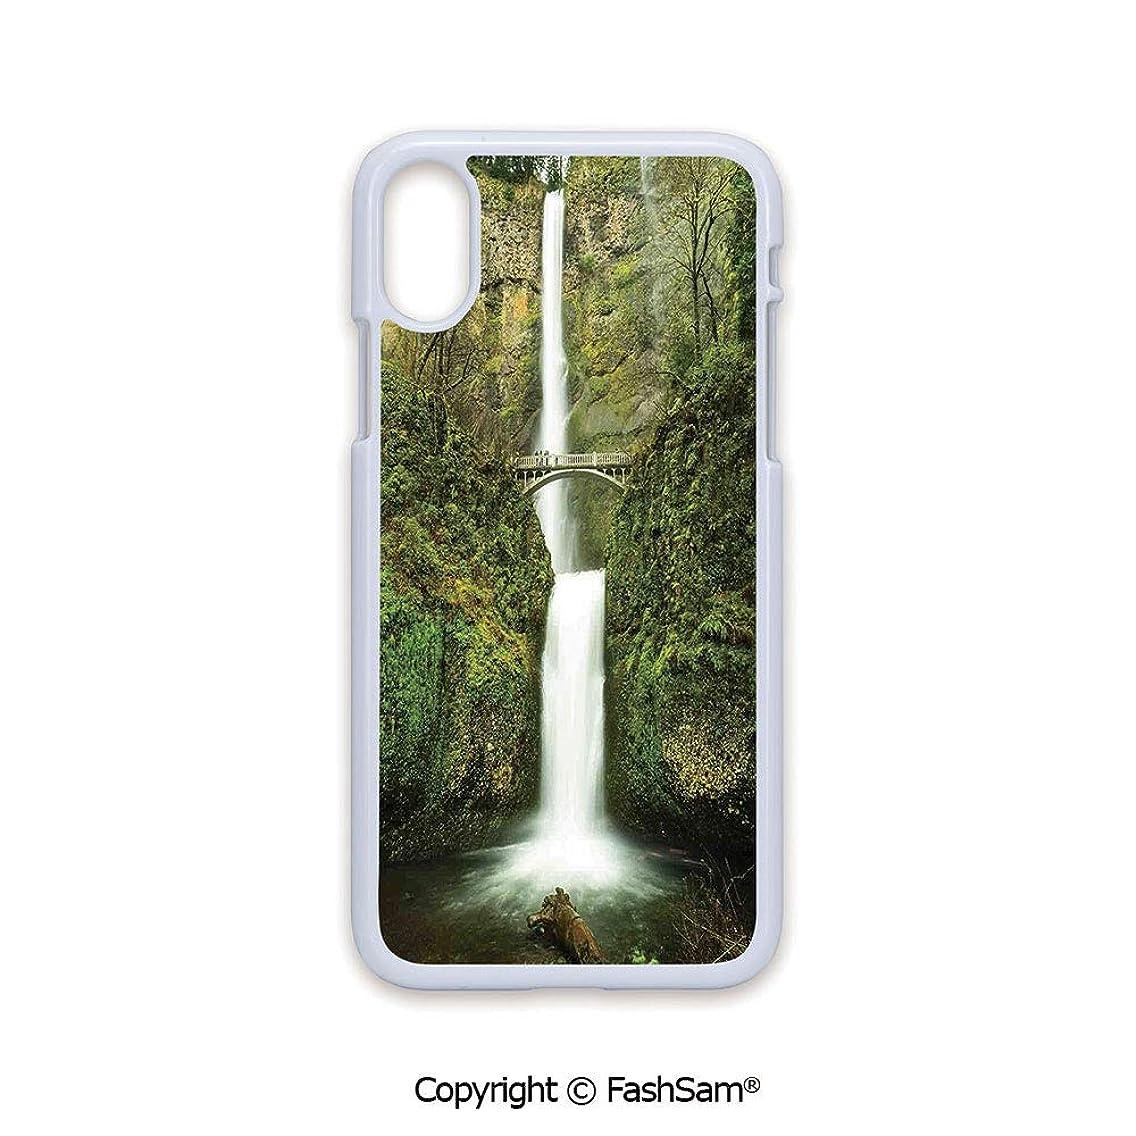 Plastic Rigid Mobile Phone case Compatible with iPhone X Black Edge Falls of Rivendell Multnomah Waterfall Oregon with Hobbit Elf Path Bridge Scene Image 2D Print Hard Plastic Phone Case